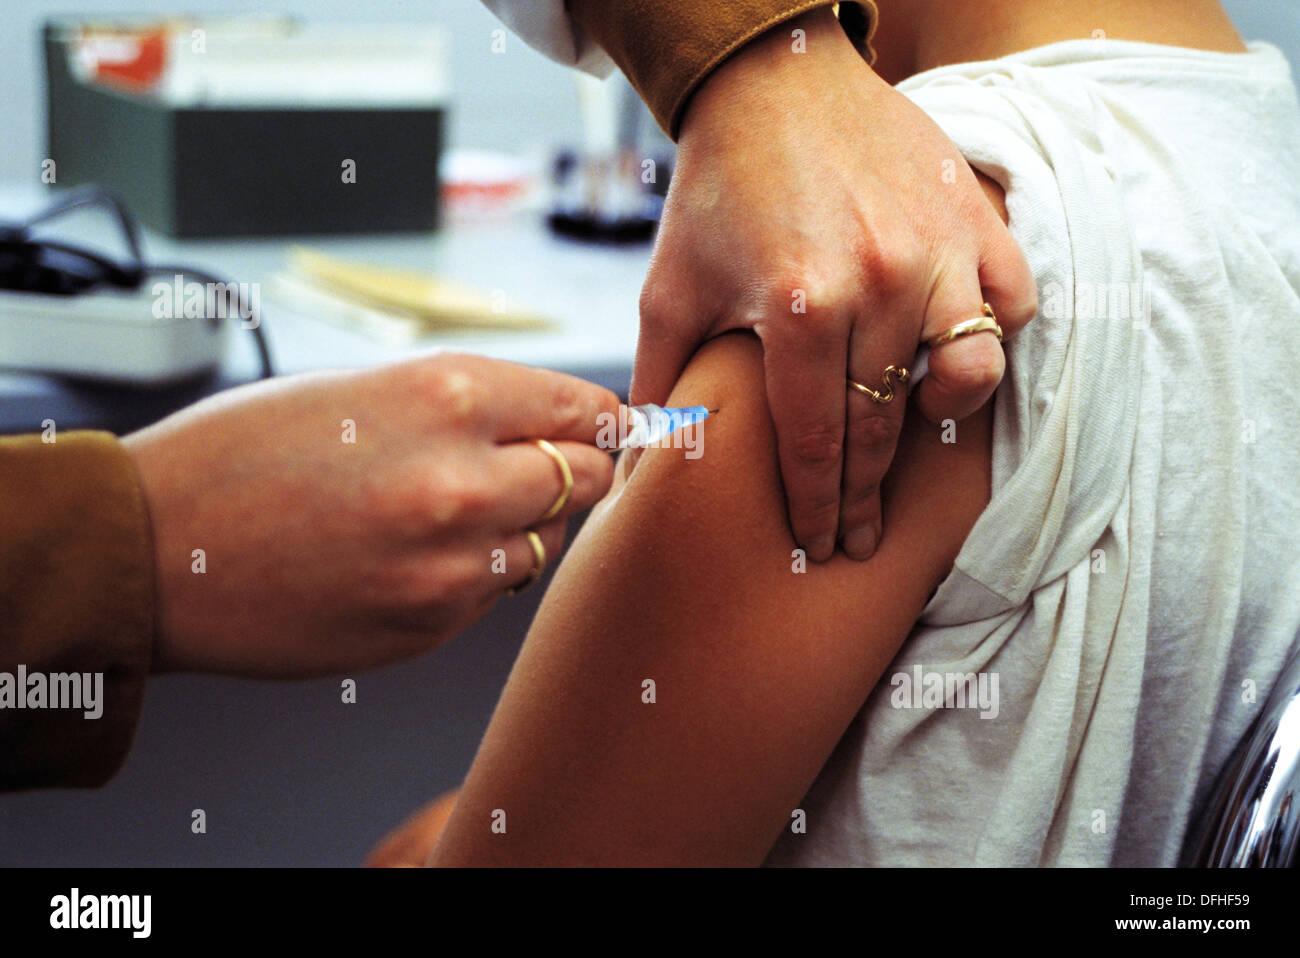 Meningitis vaccine - Stock Image